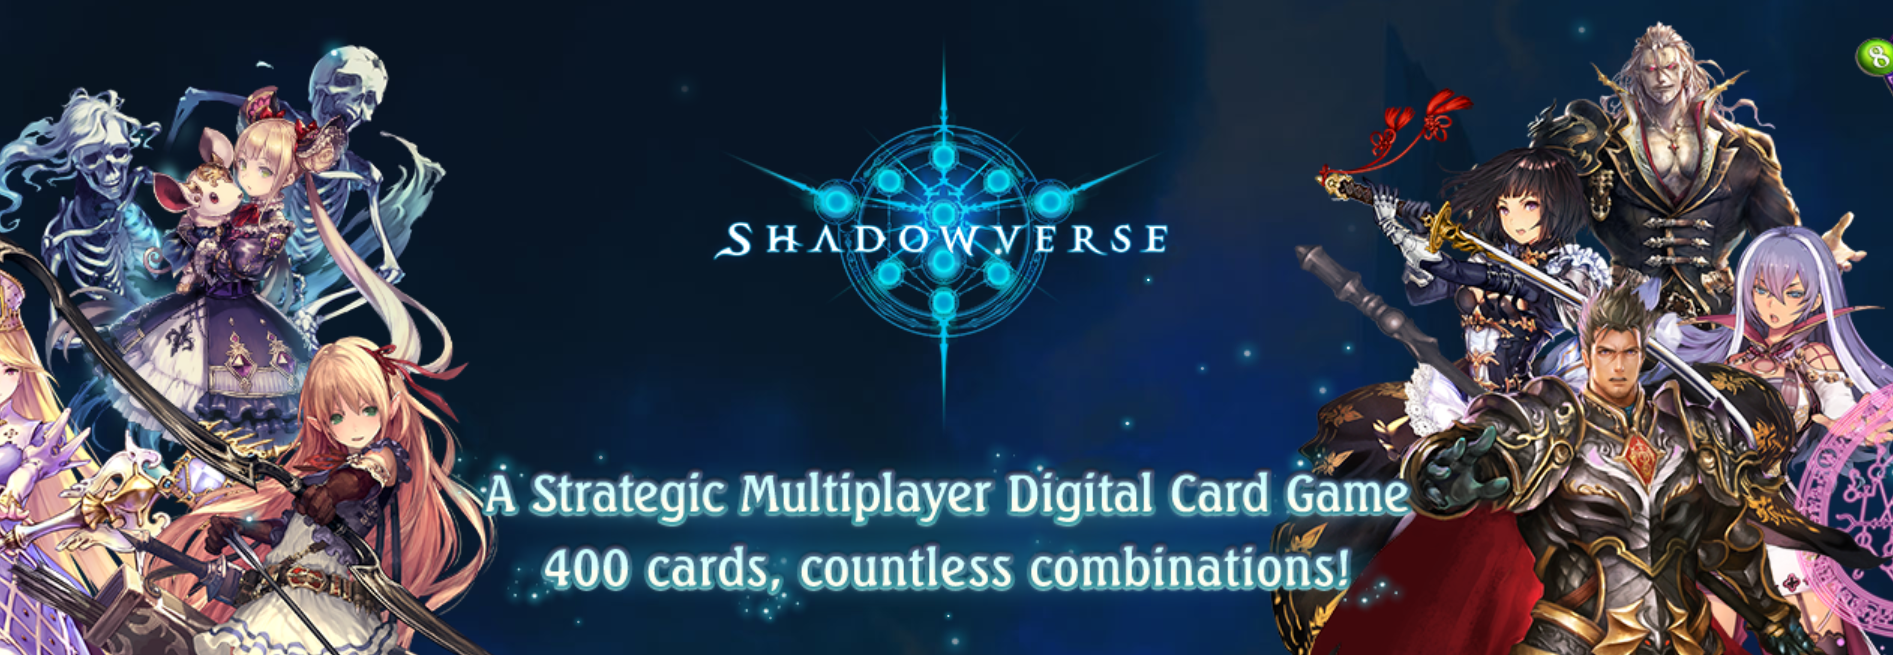 image source: https://shadowverse.com/